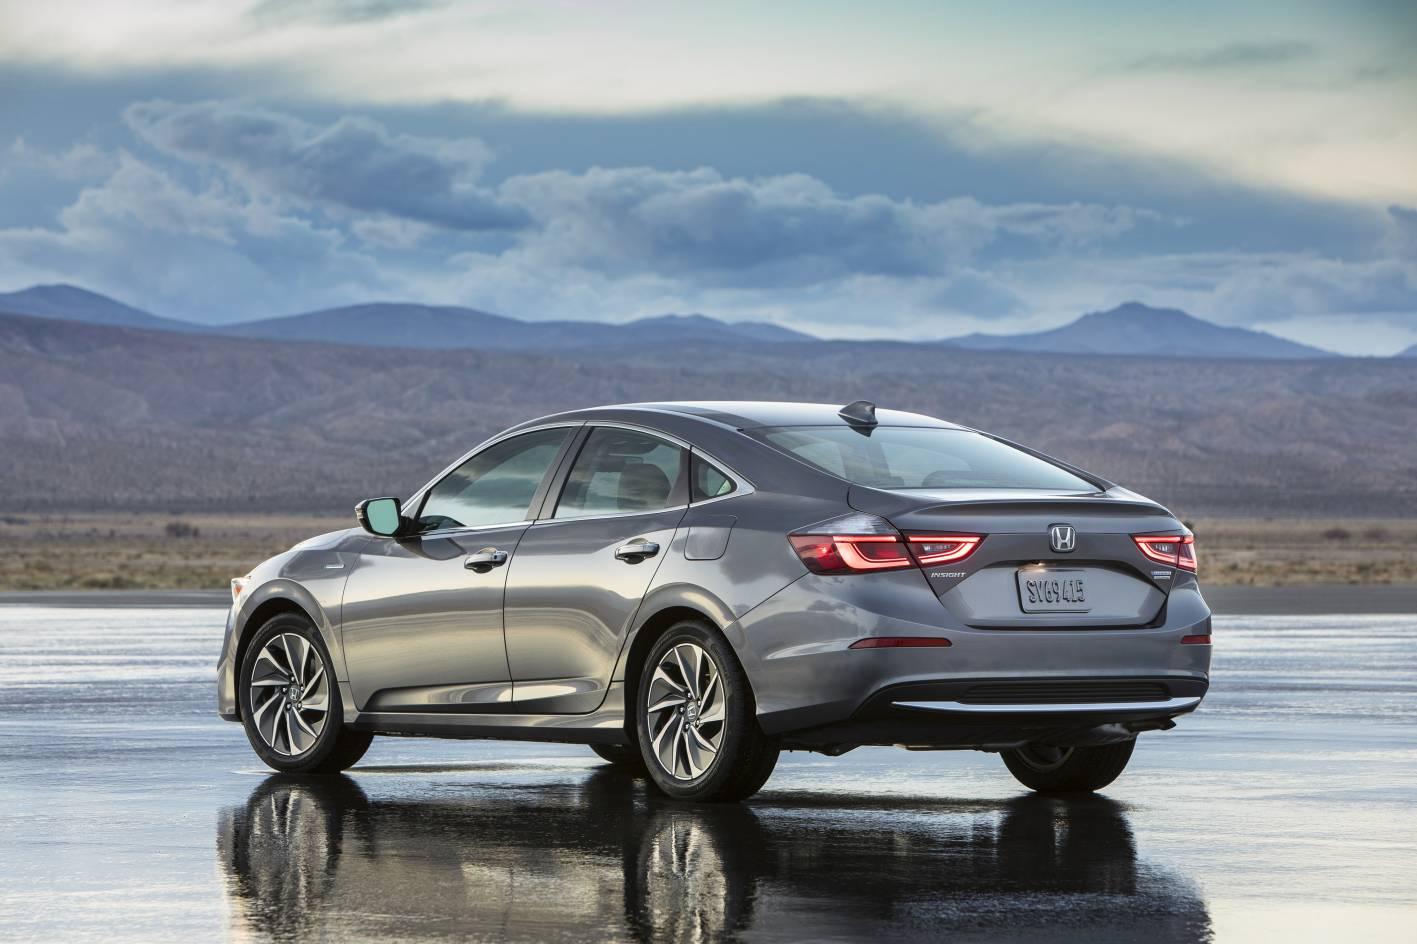 All New 2019 Honda Insight Production Model Revealed